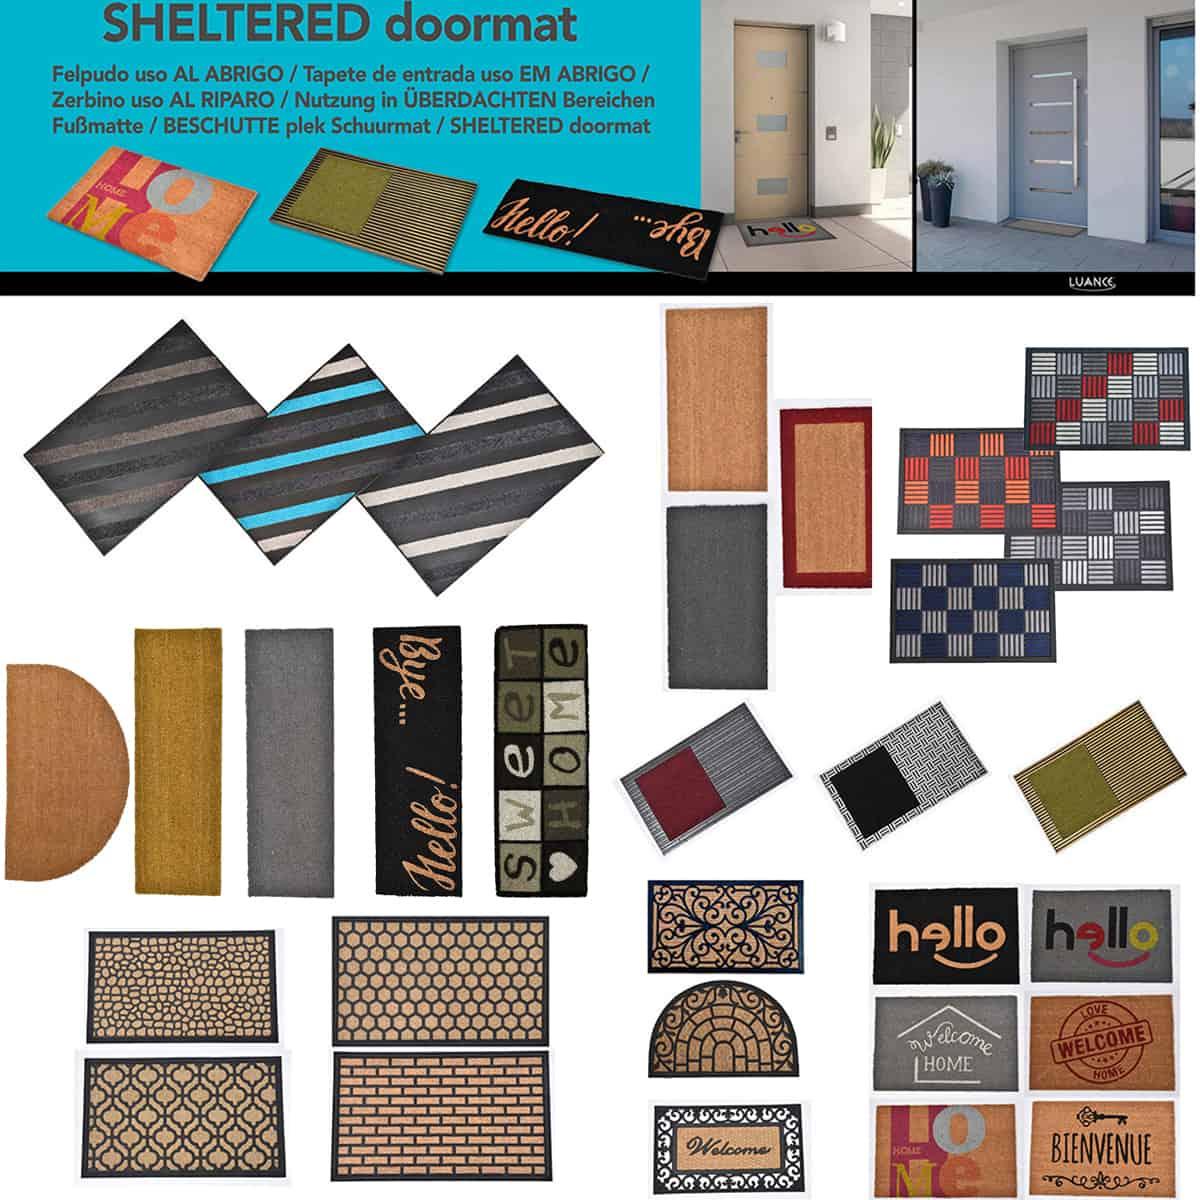 Sheltered Front Door Mat Coir Coco Fibers Rug 24x16 Natural